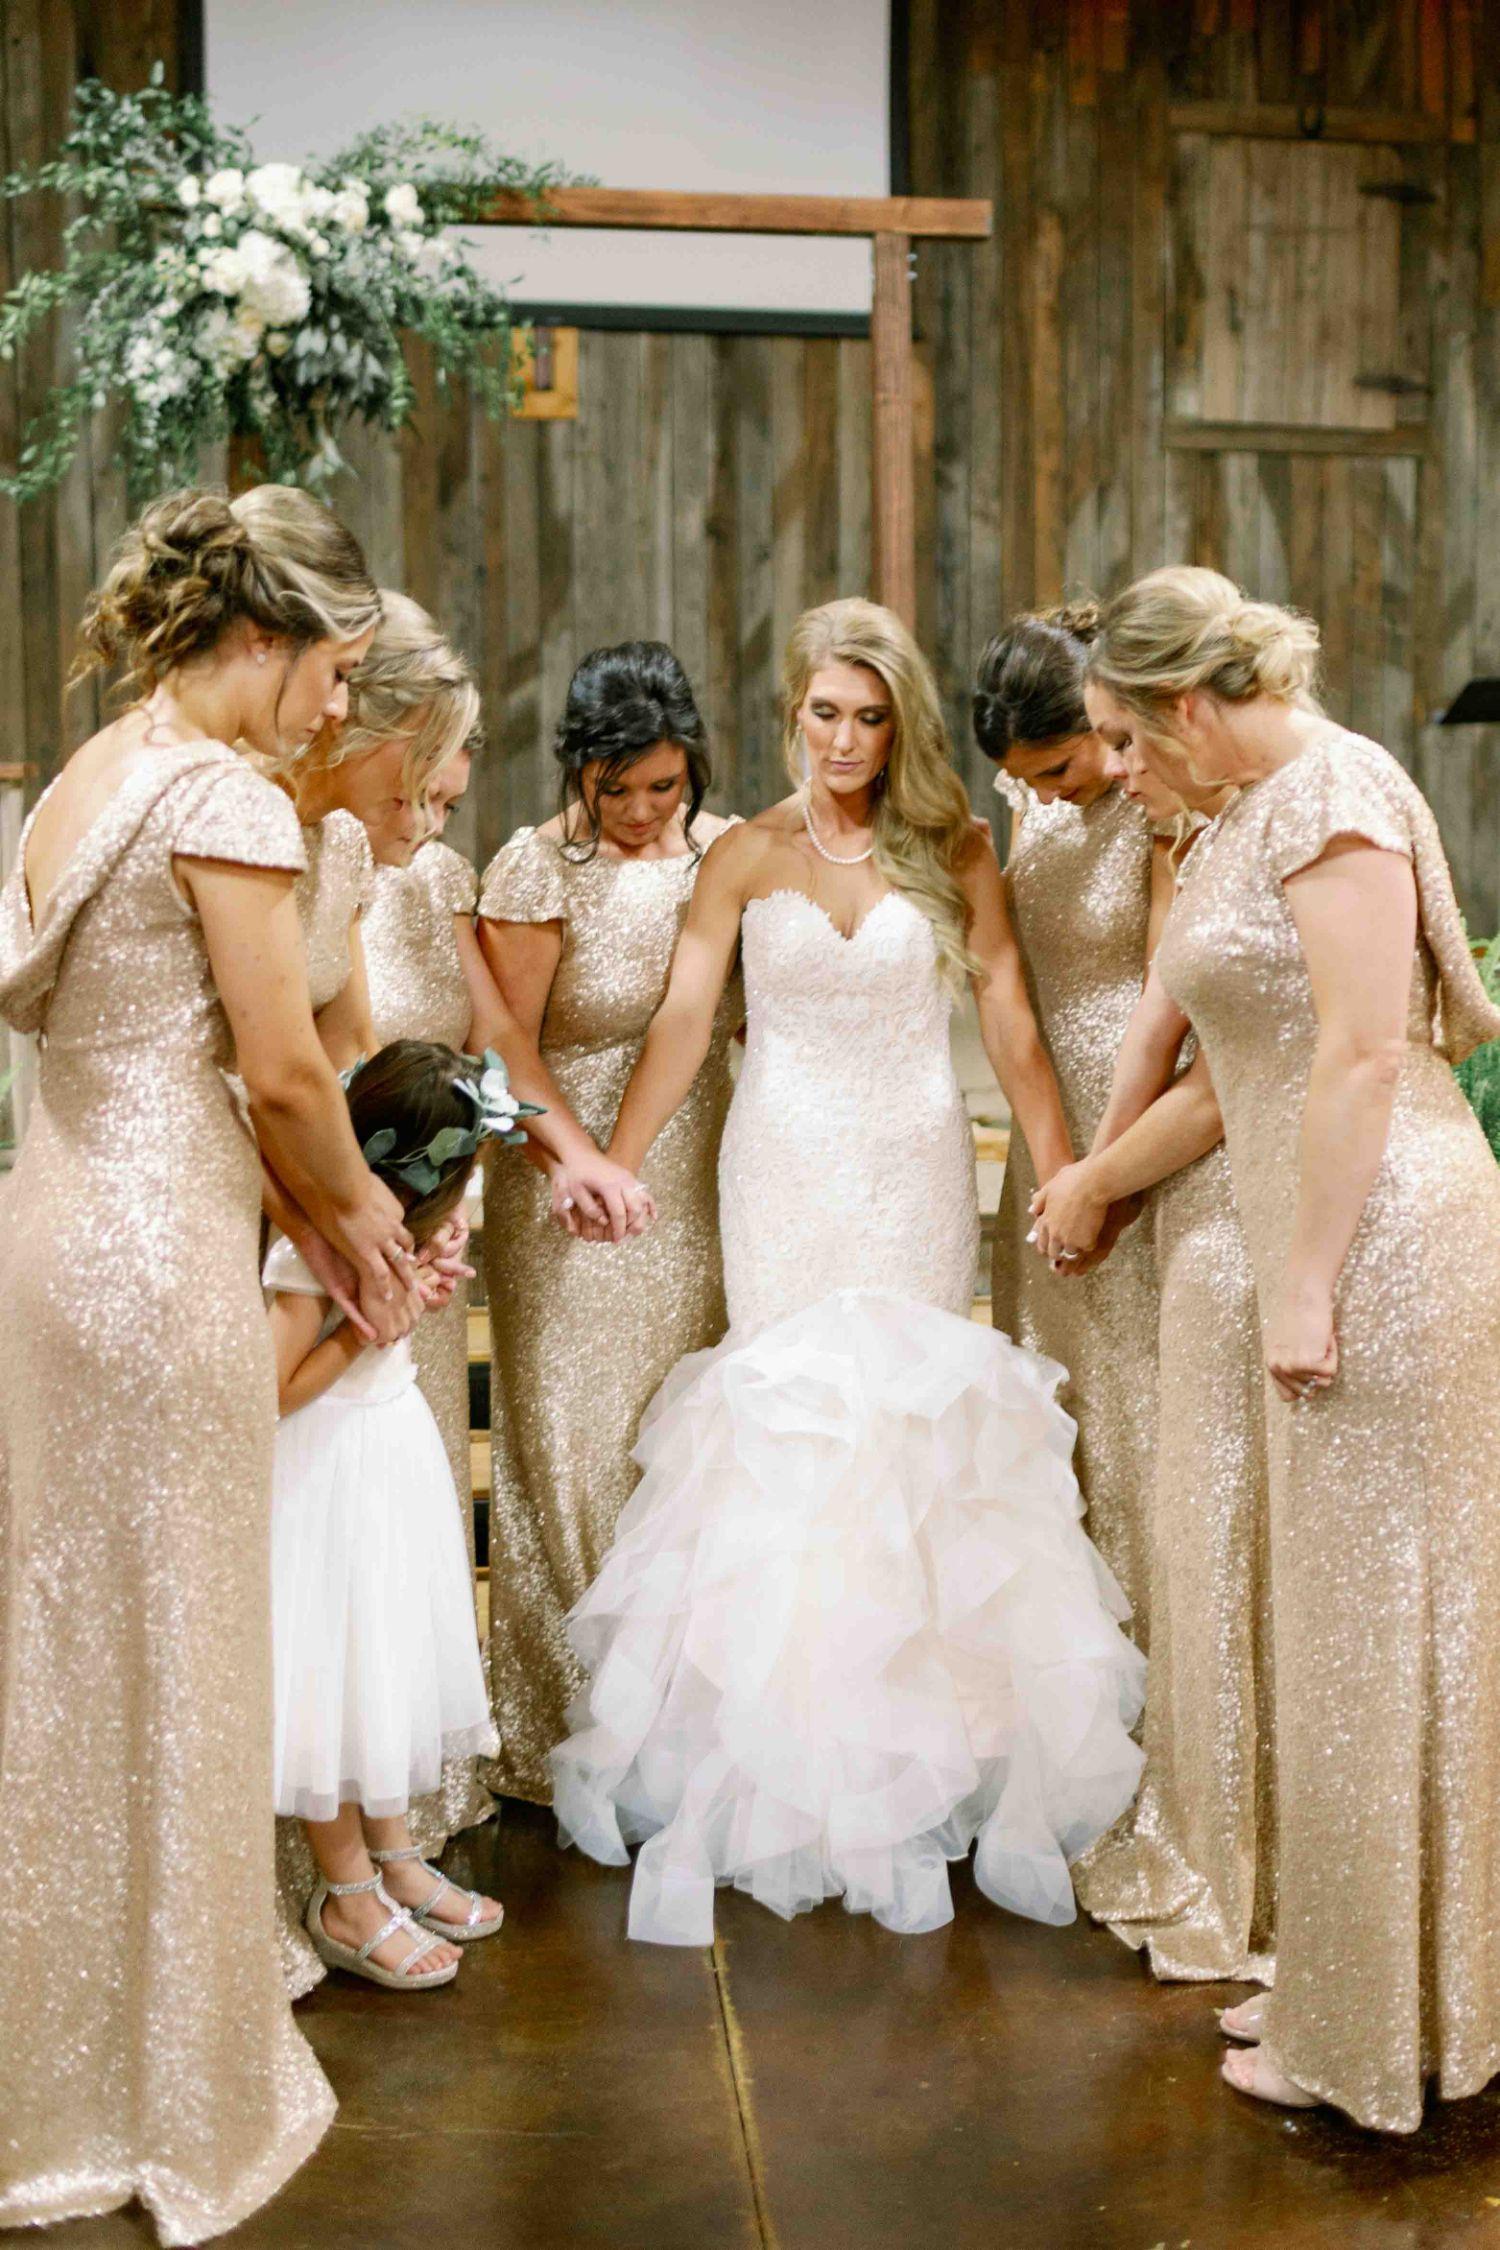 wichita-falls-wedding-katelyn-colten-vernon-texas-23.jpg